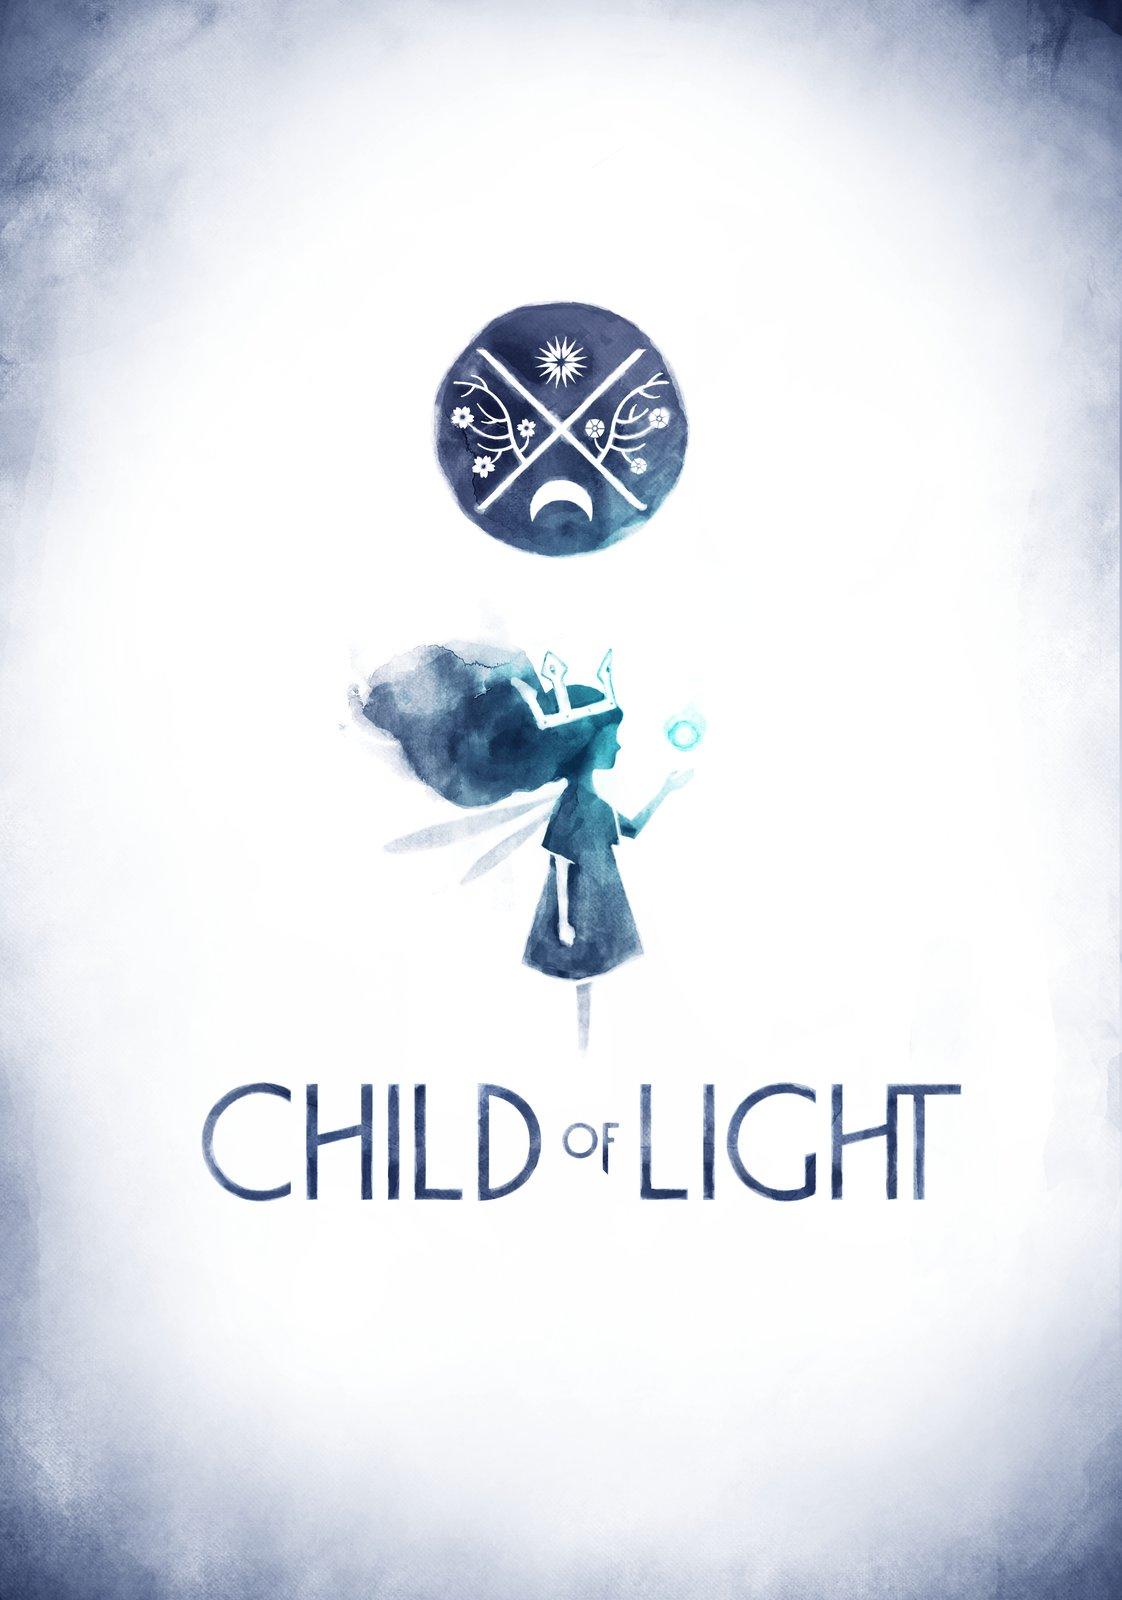 Child of Light - Child of Light Wiki